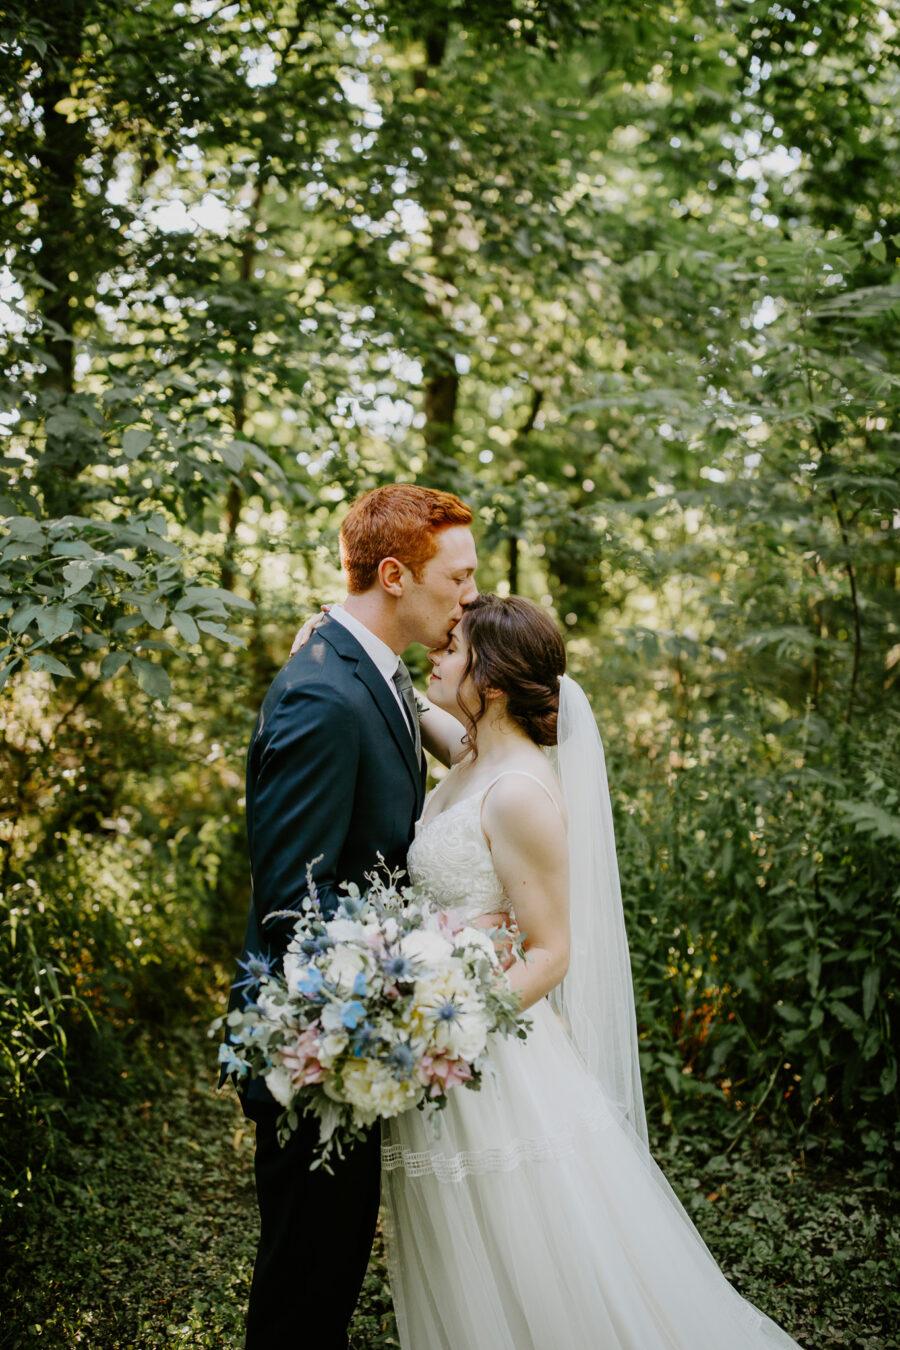 Wedding portrait: Vibrant Summer Wedding at Sinking Creek Farm featured on Nashville Bride Guide